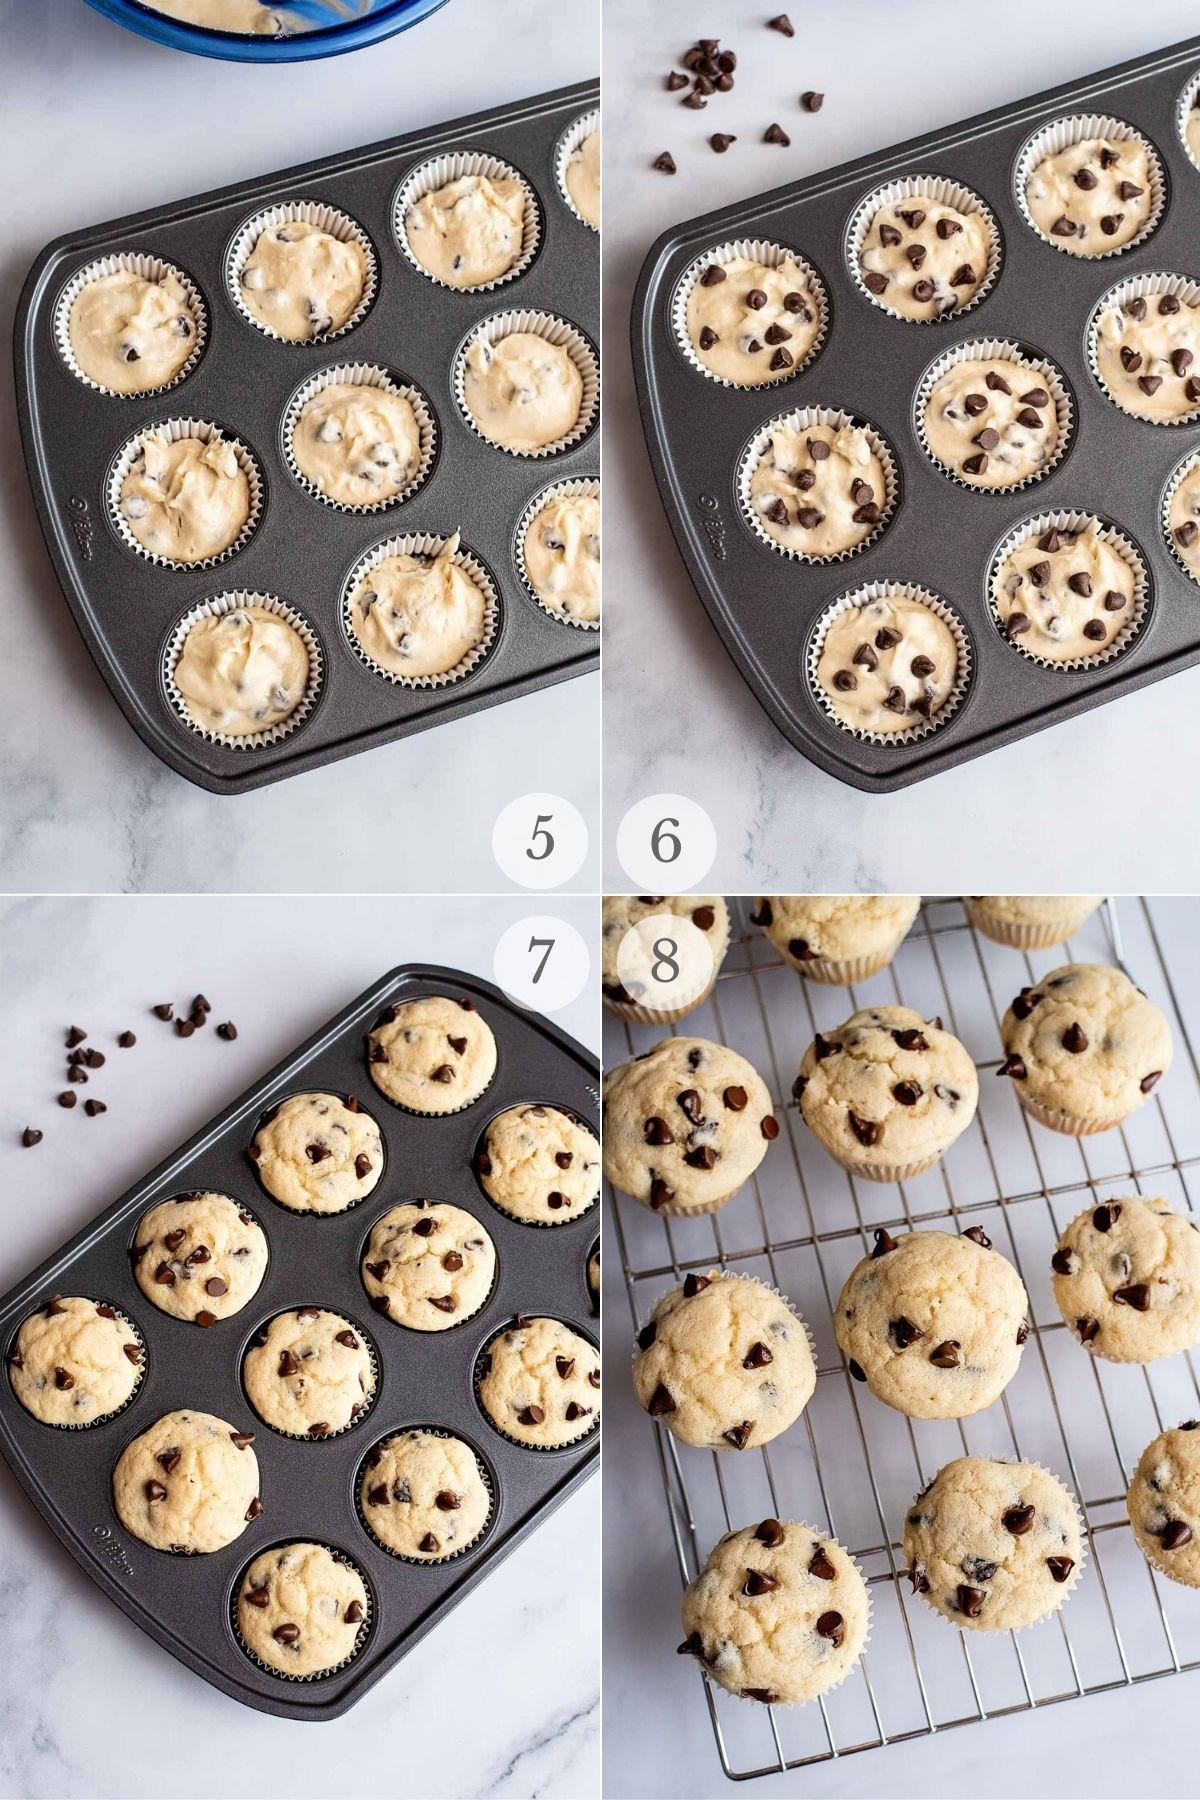 chocolate chip muffins recipe steps 5-8